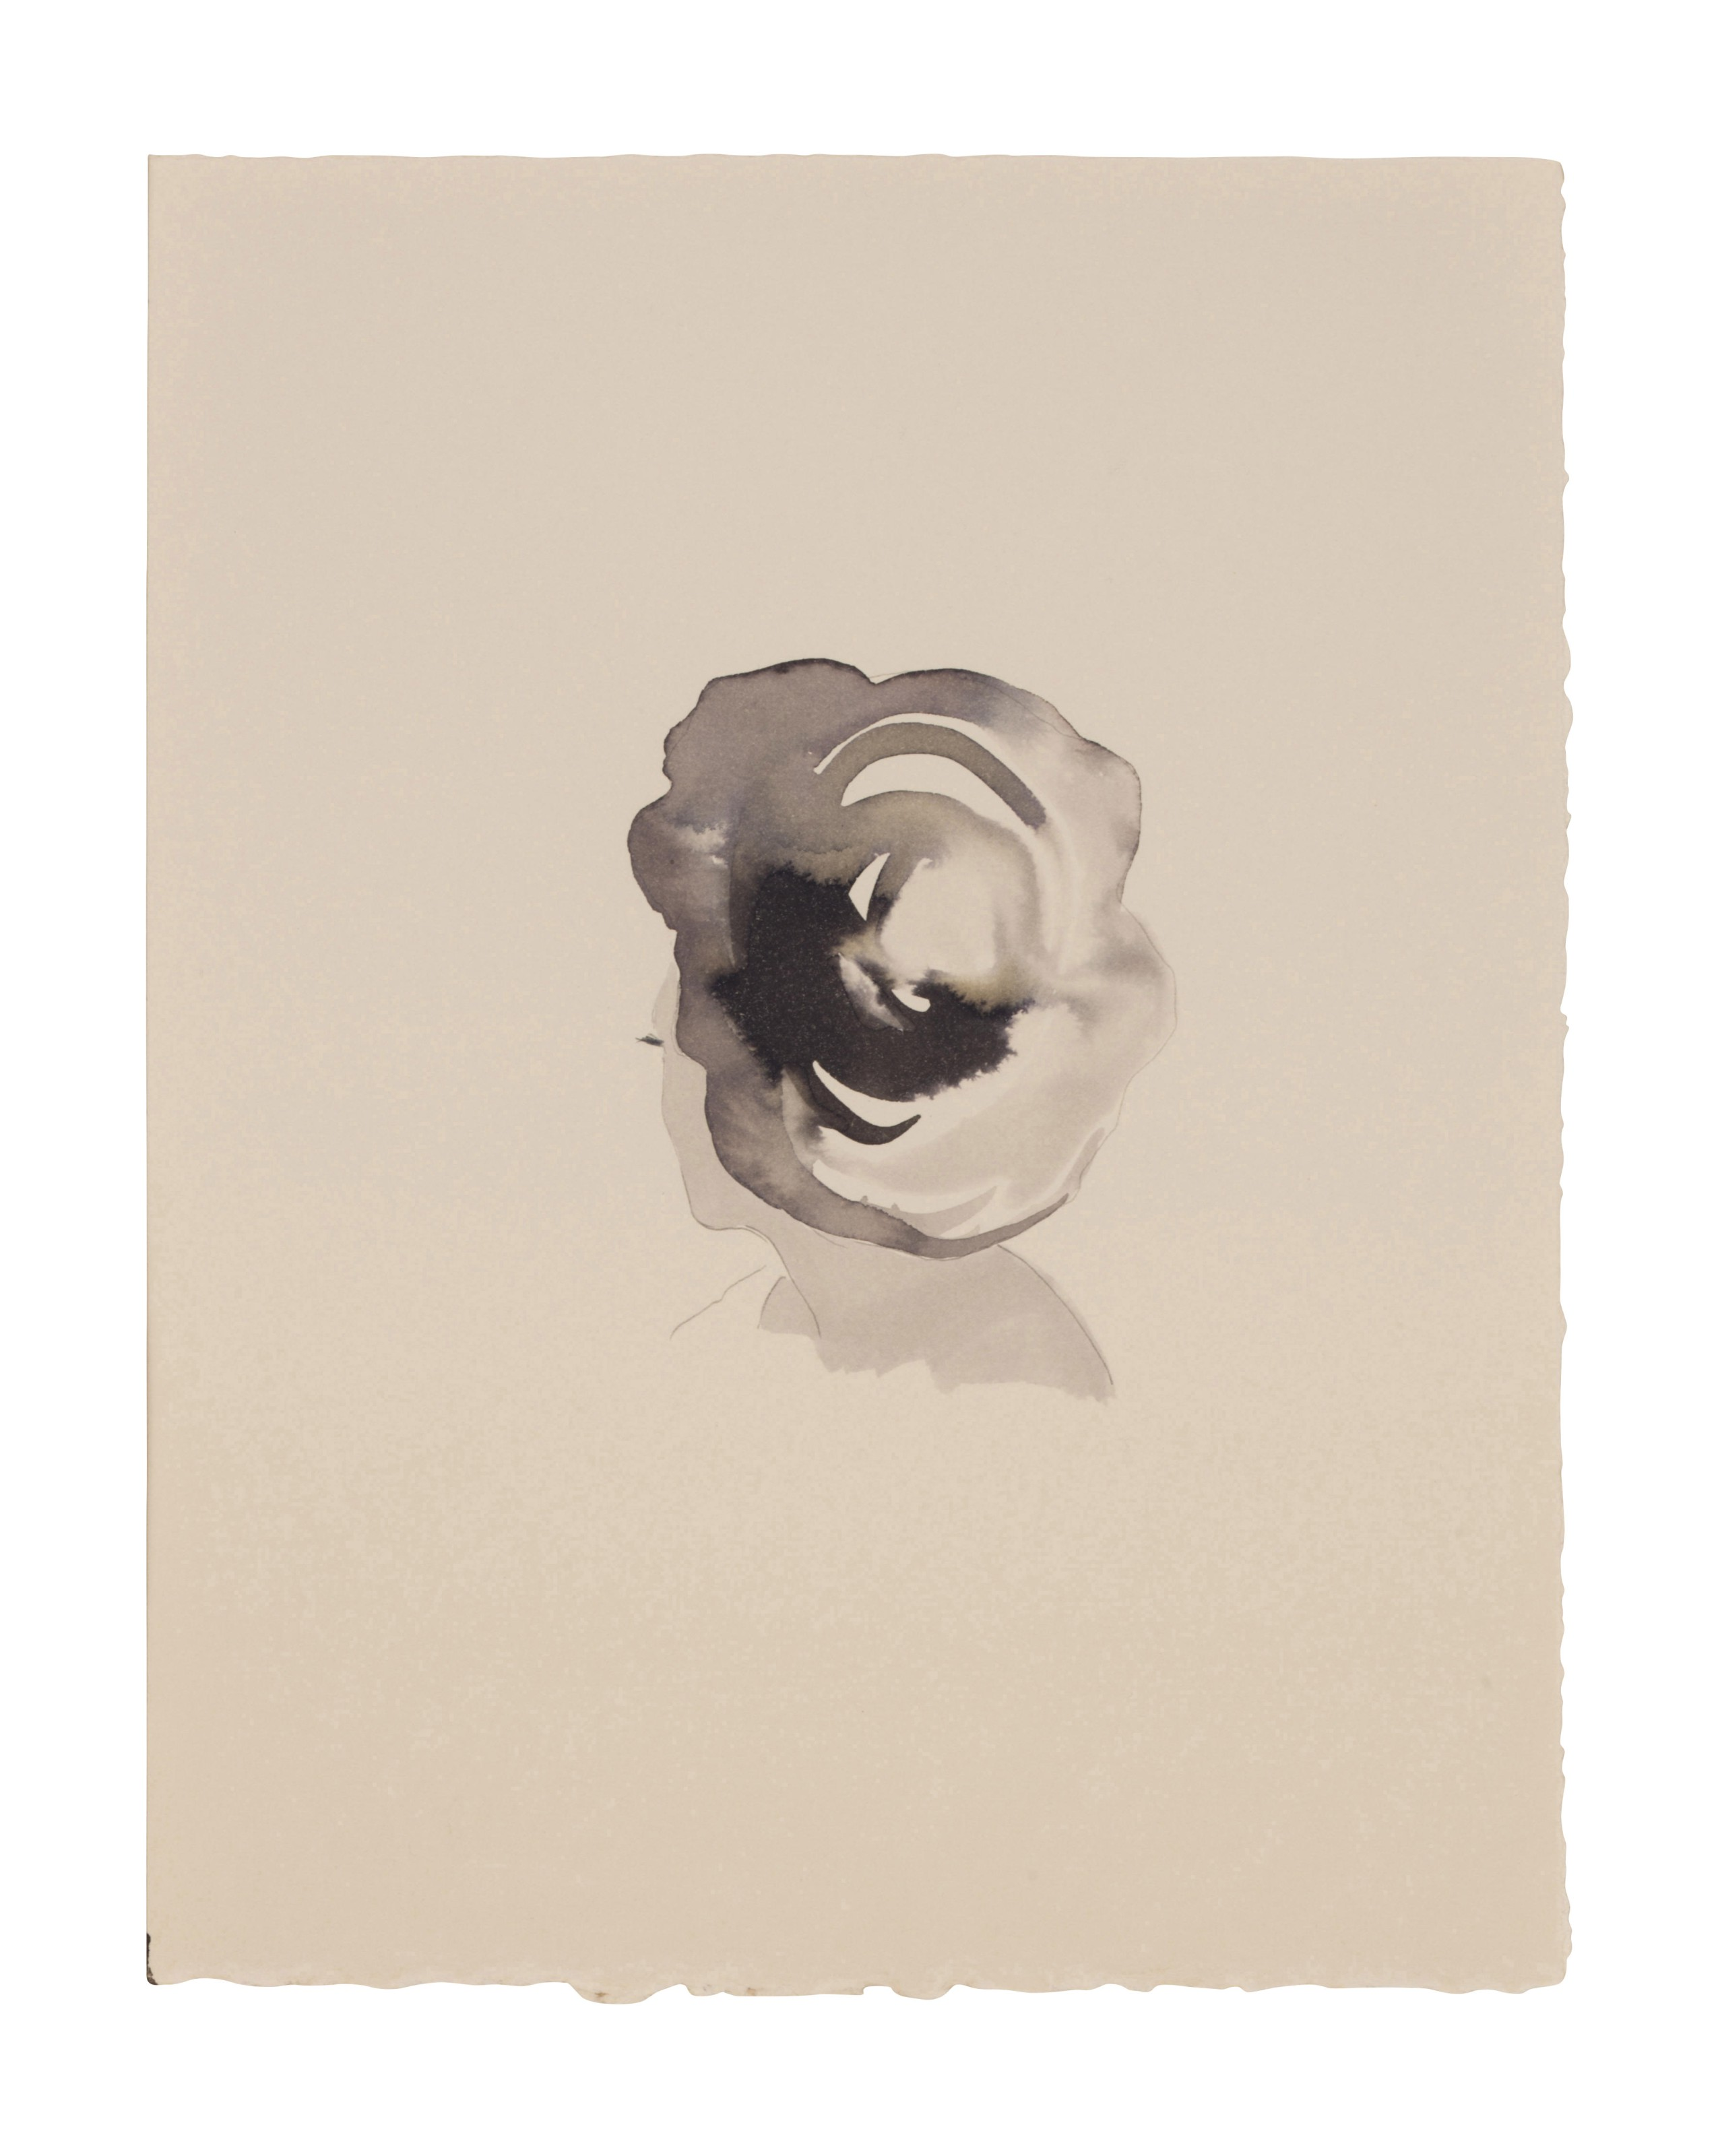 LORNA SIMPSON (B. 1960)